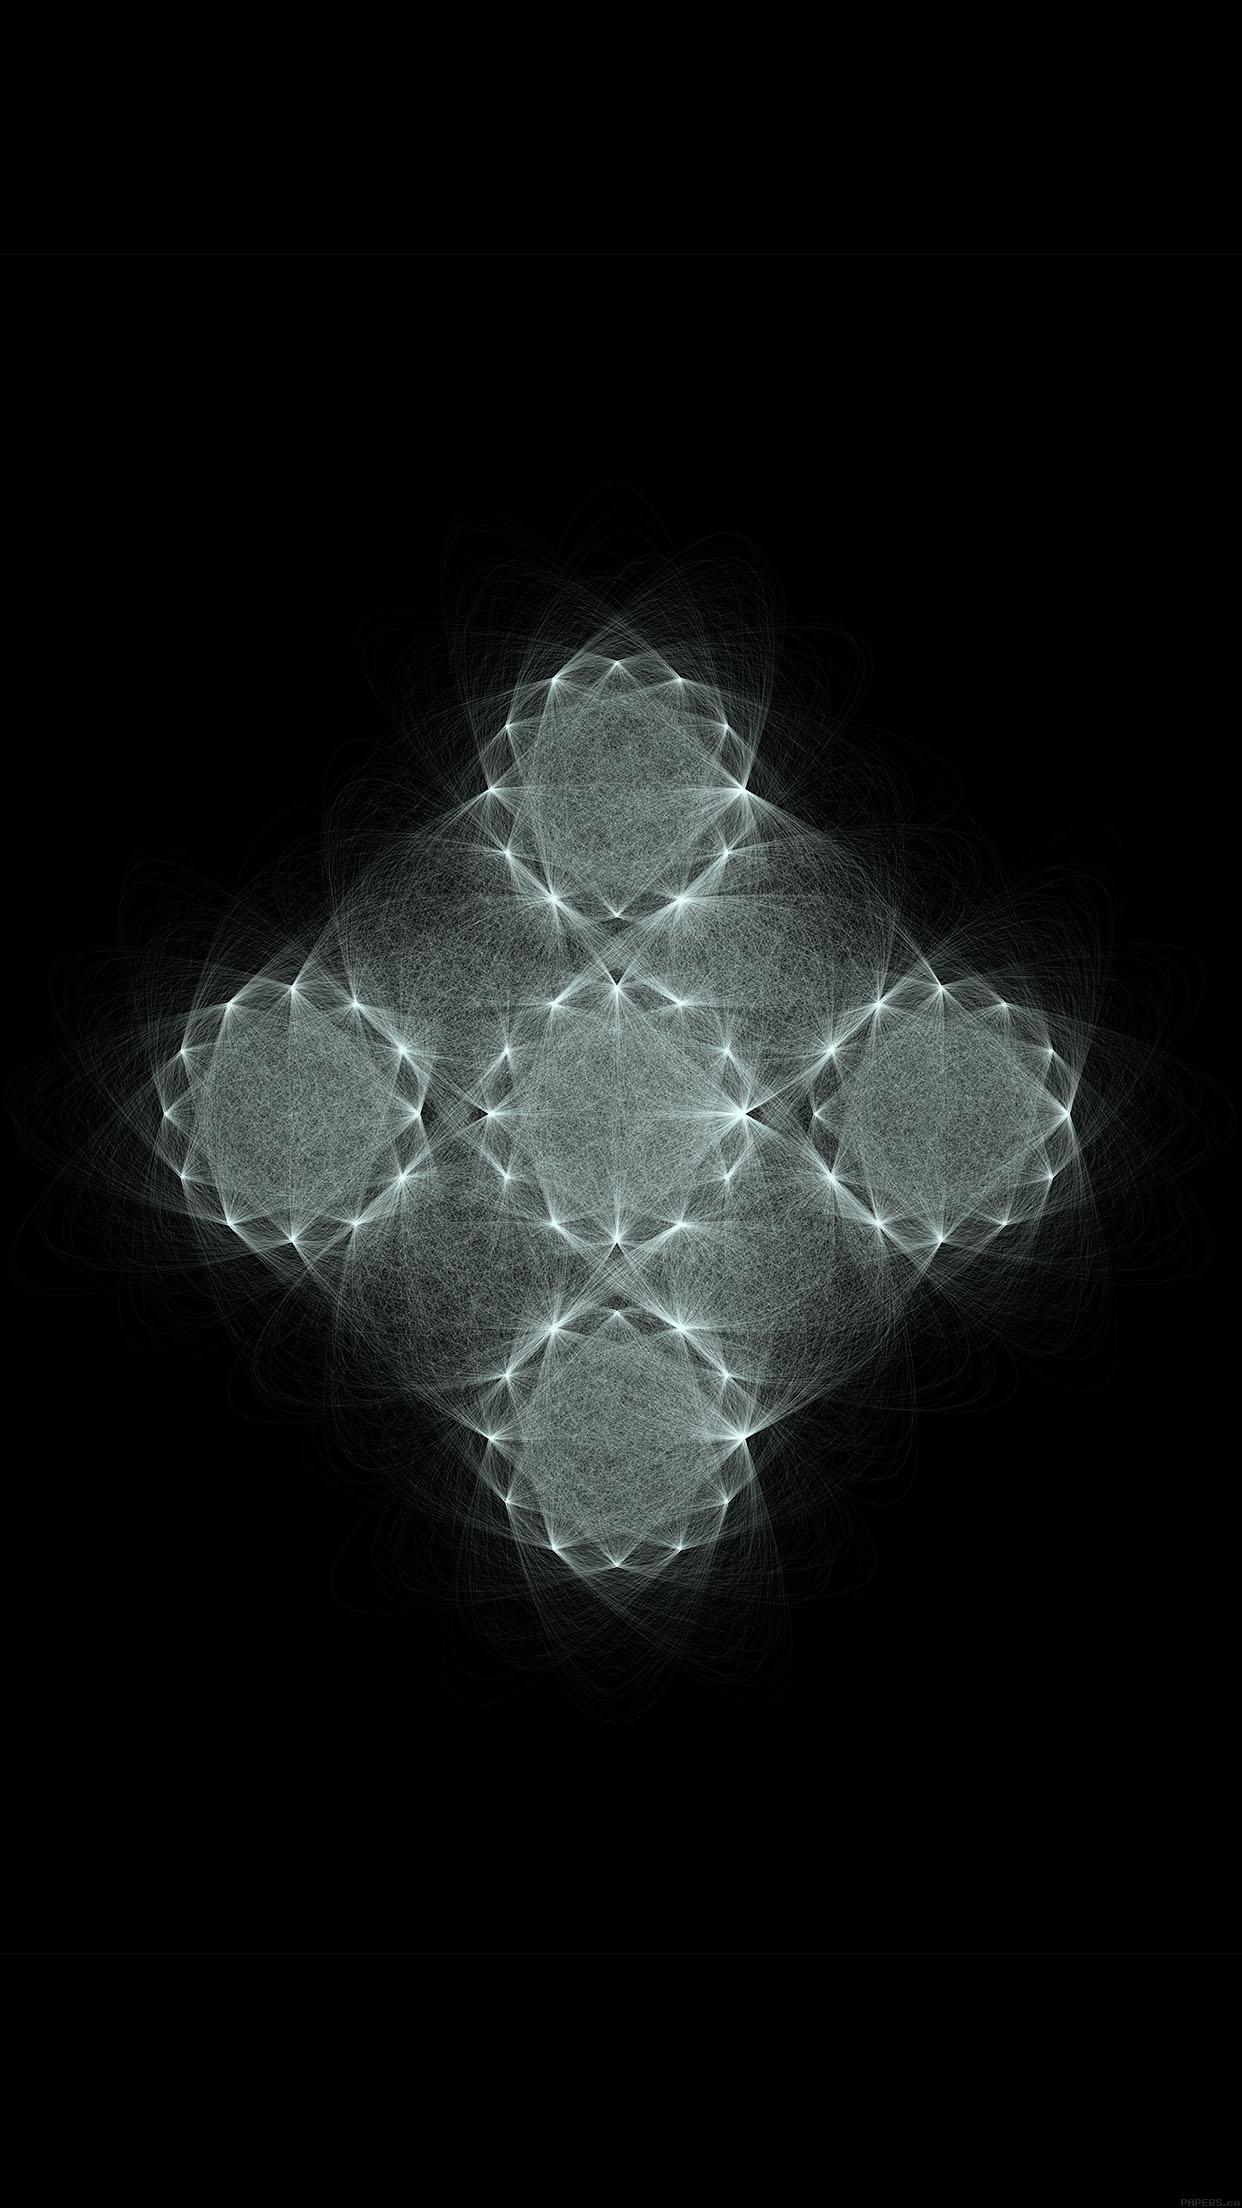 Papersco Iphone Wallpaper Vb05 Wallpaper Crystal Math